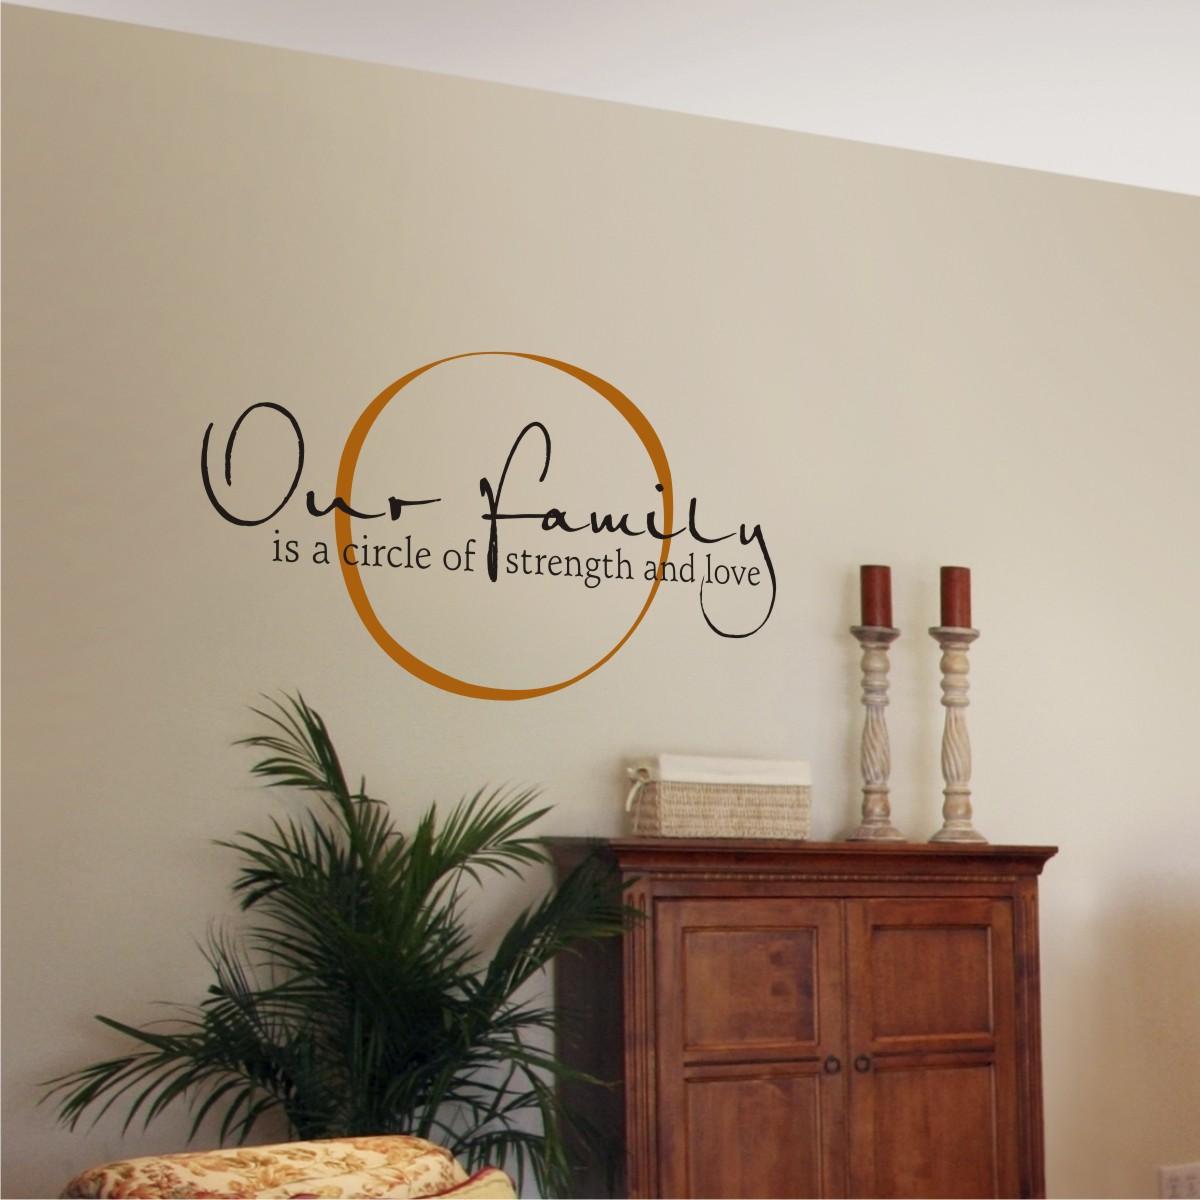 vinyl wall quotes quotesgram. Black Bedroom Furniture Sets. Home Design Ideas